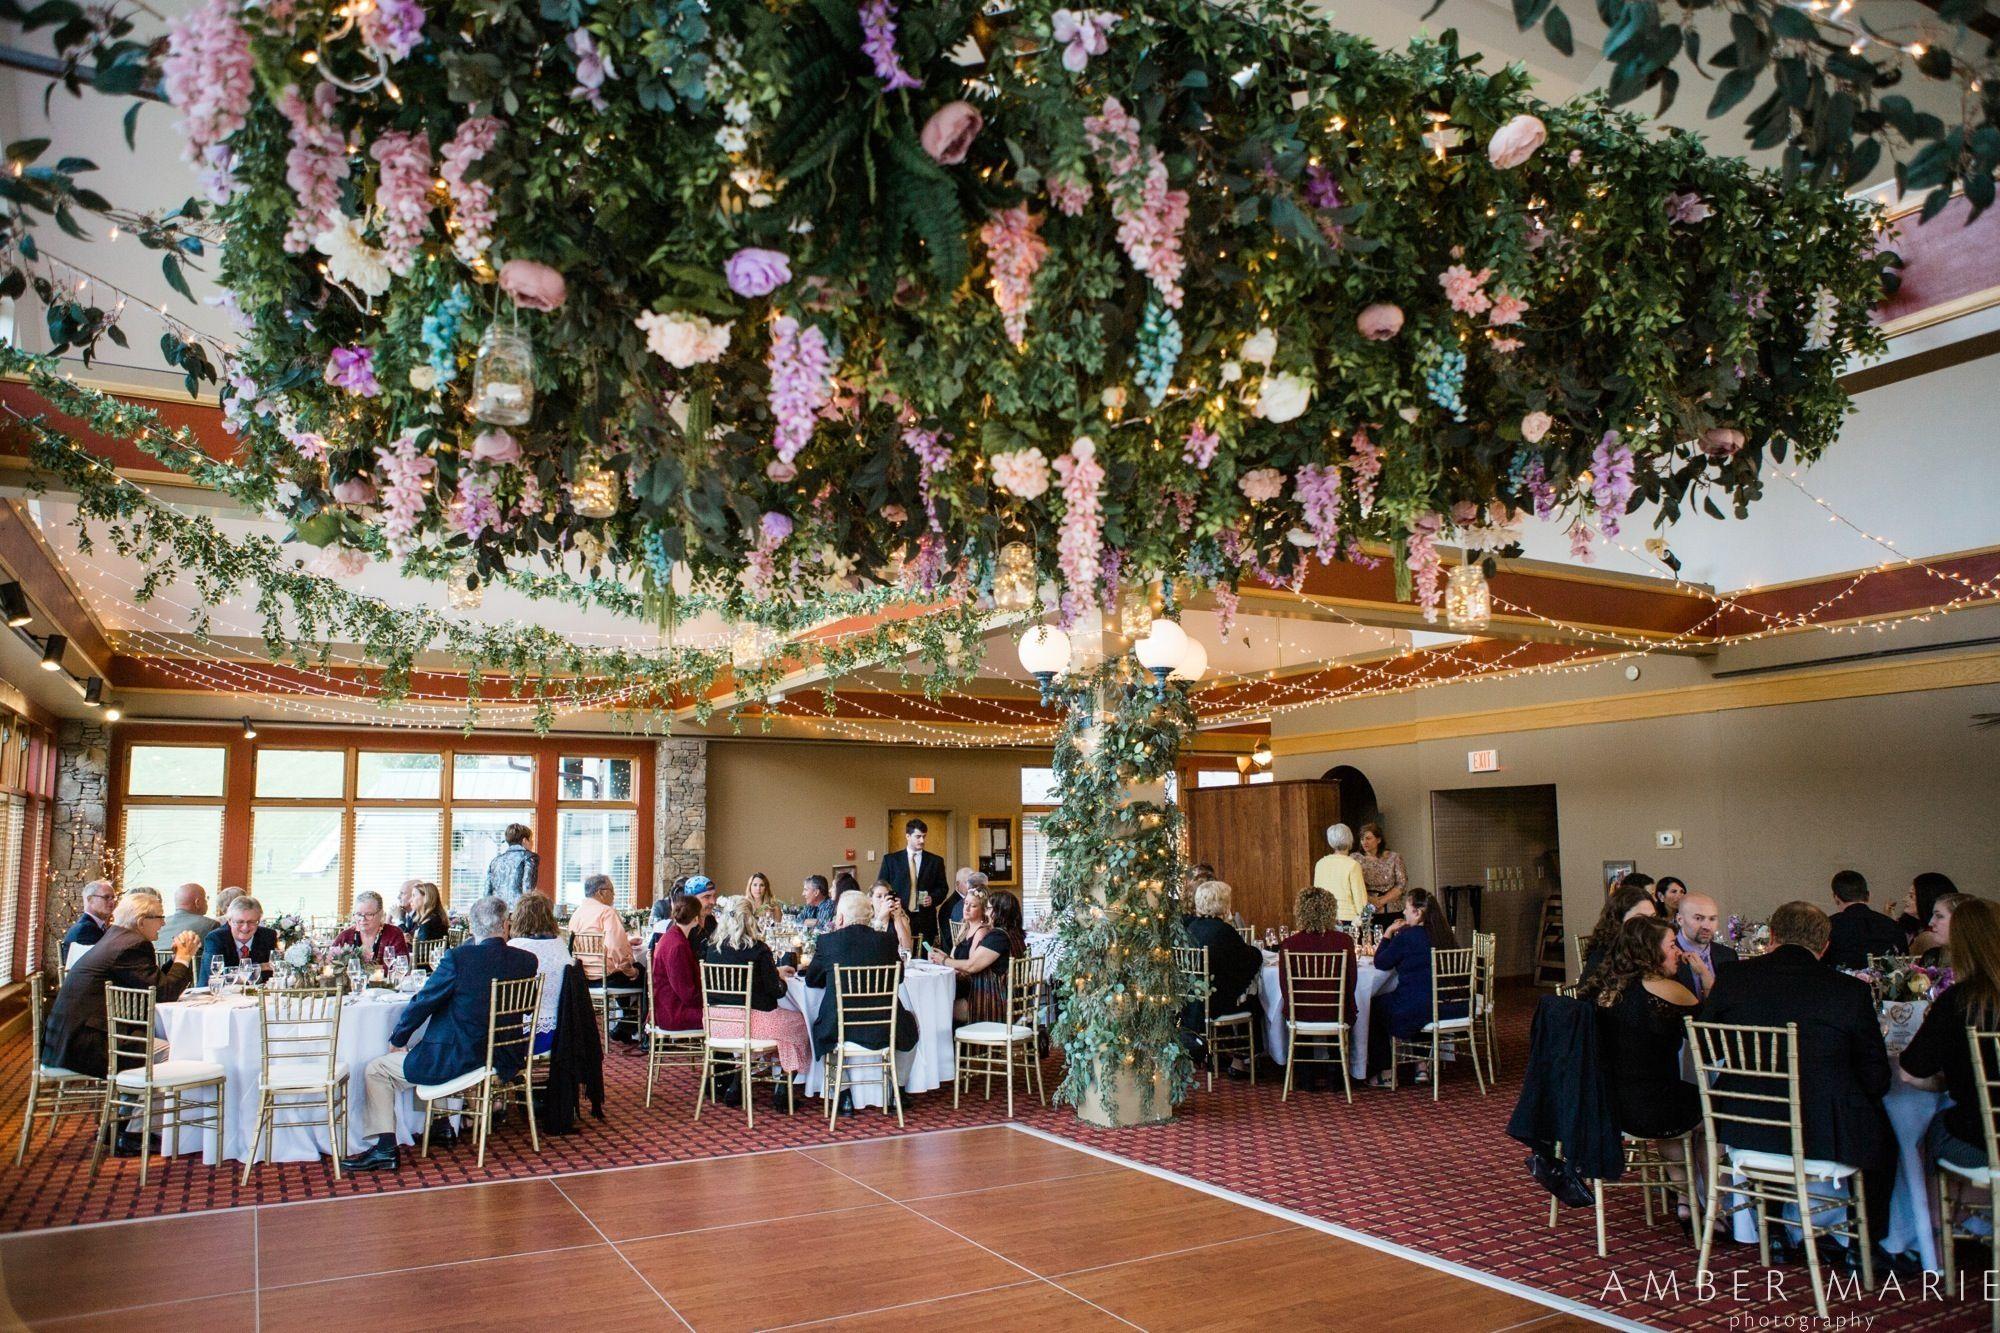 Https Ambermariephoto Com Hiddenvalleywedding Reception Clocktower Lindabrownsfloral Clock Tower Resort Dolores Park